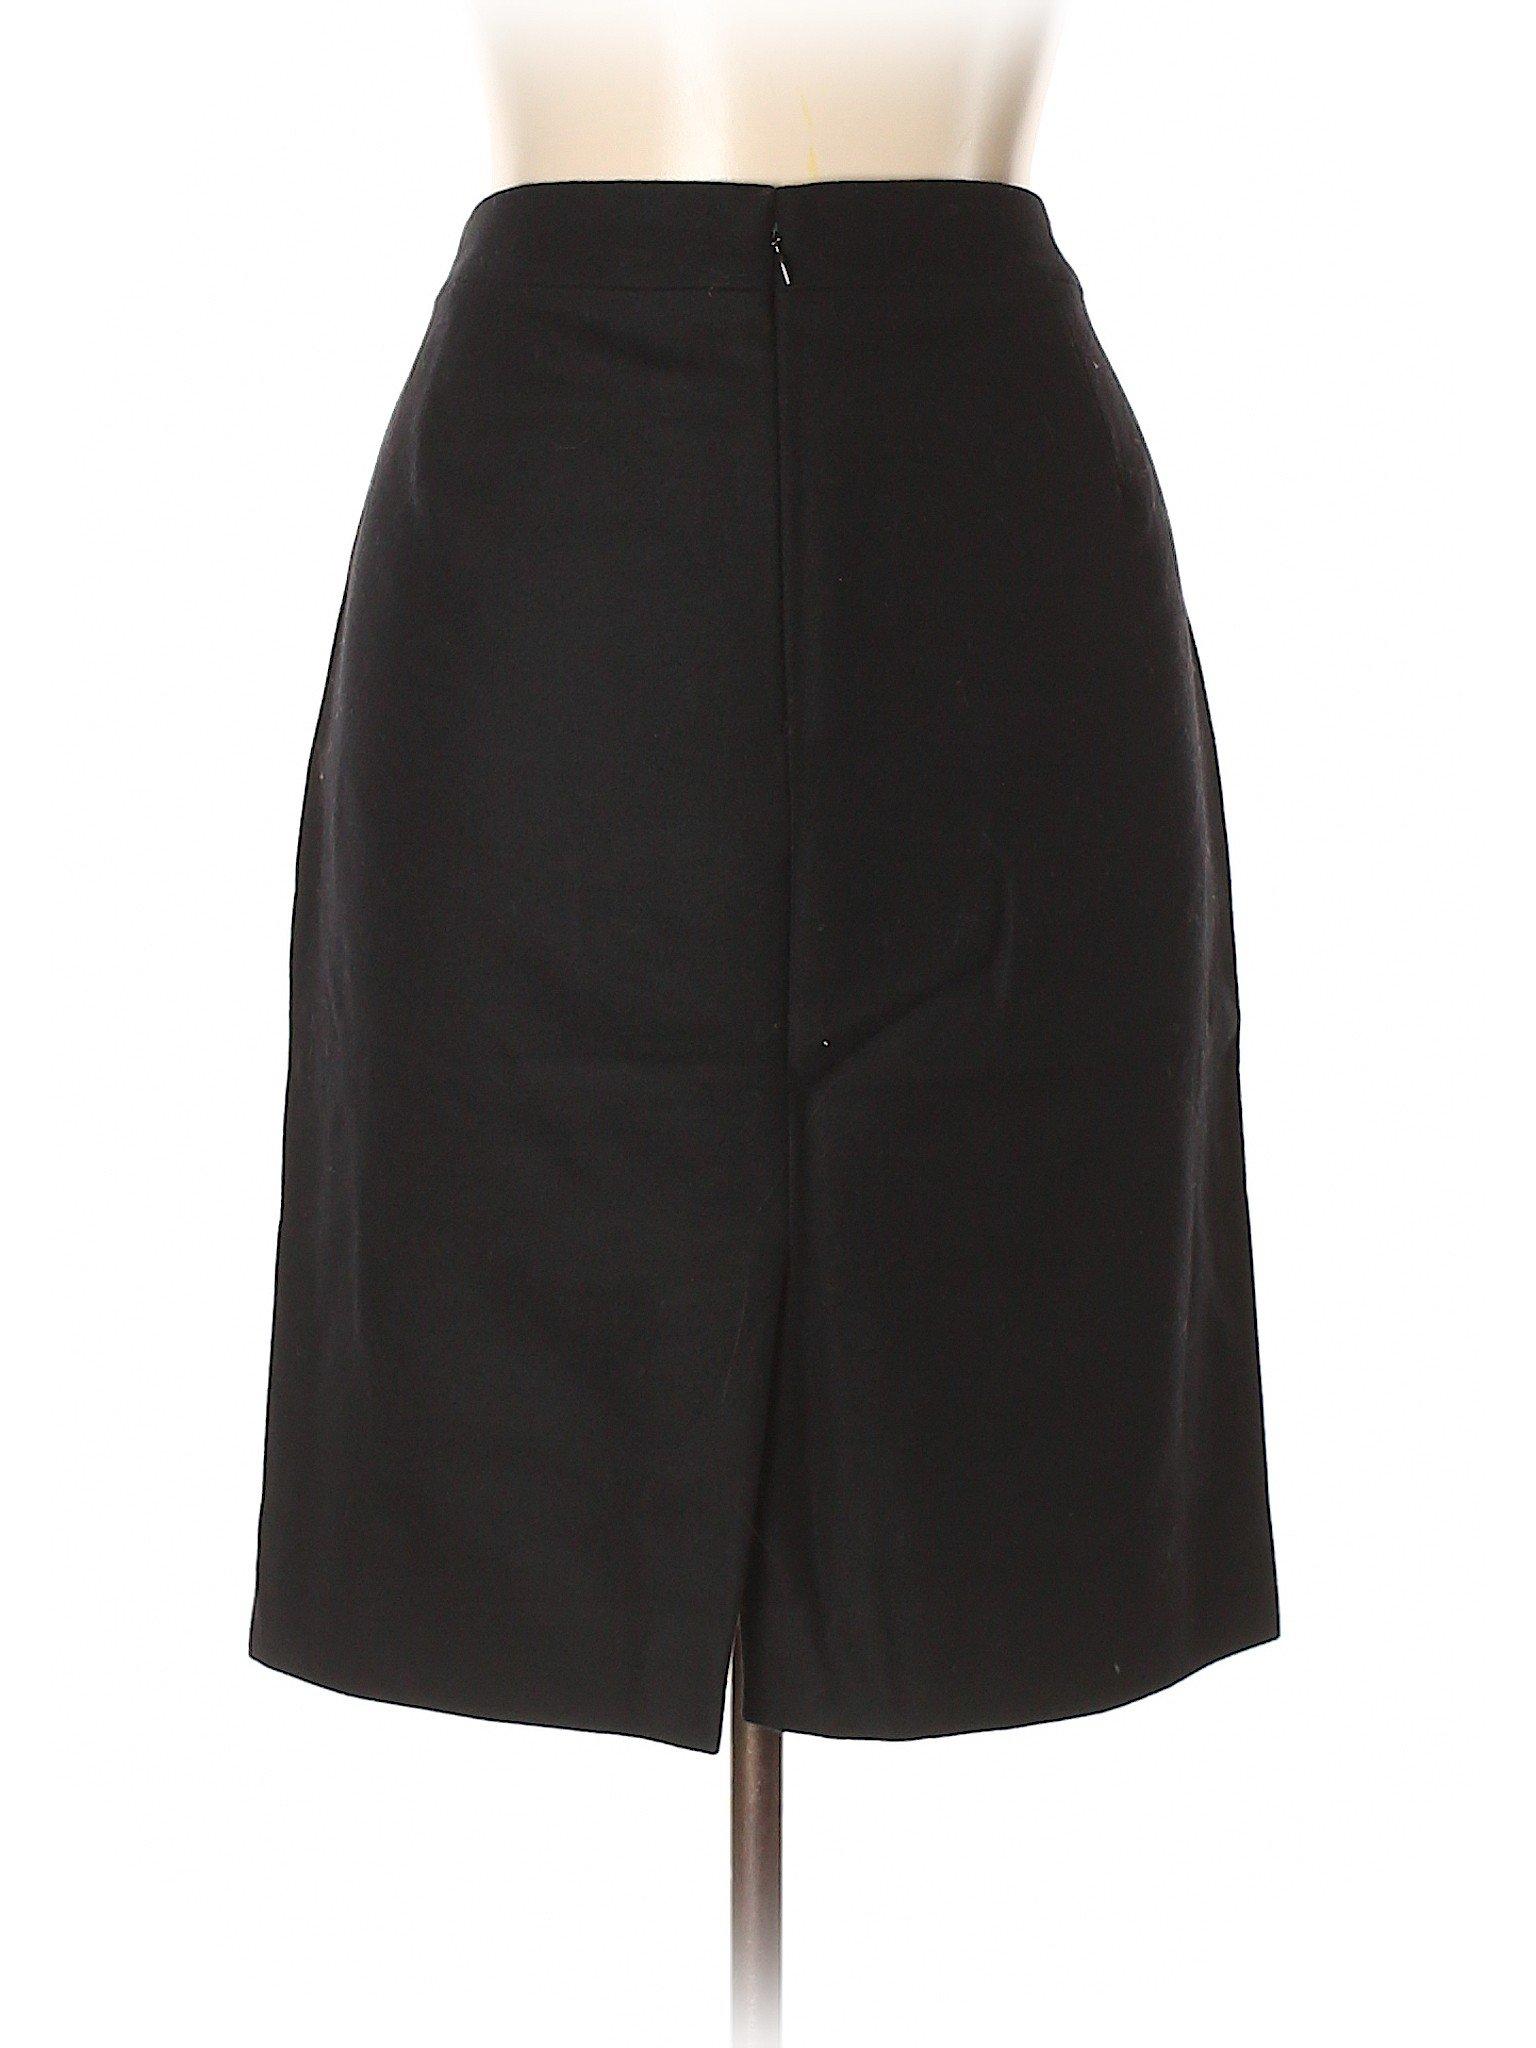 J Wool Boutique Crew Factory Skirt Store leisure 5r5pqnxa